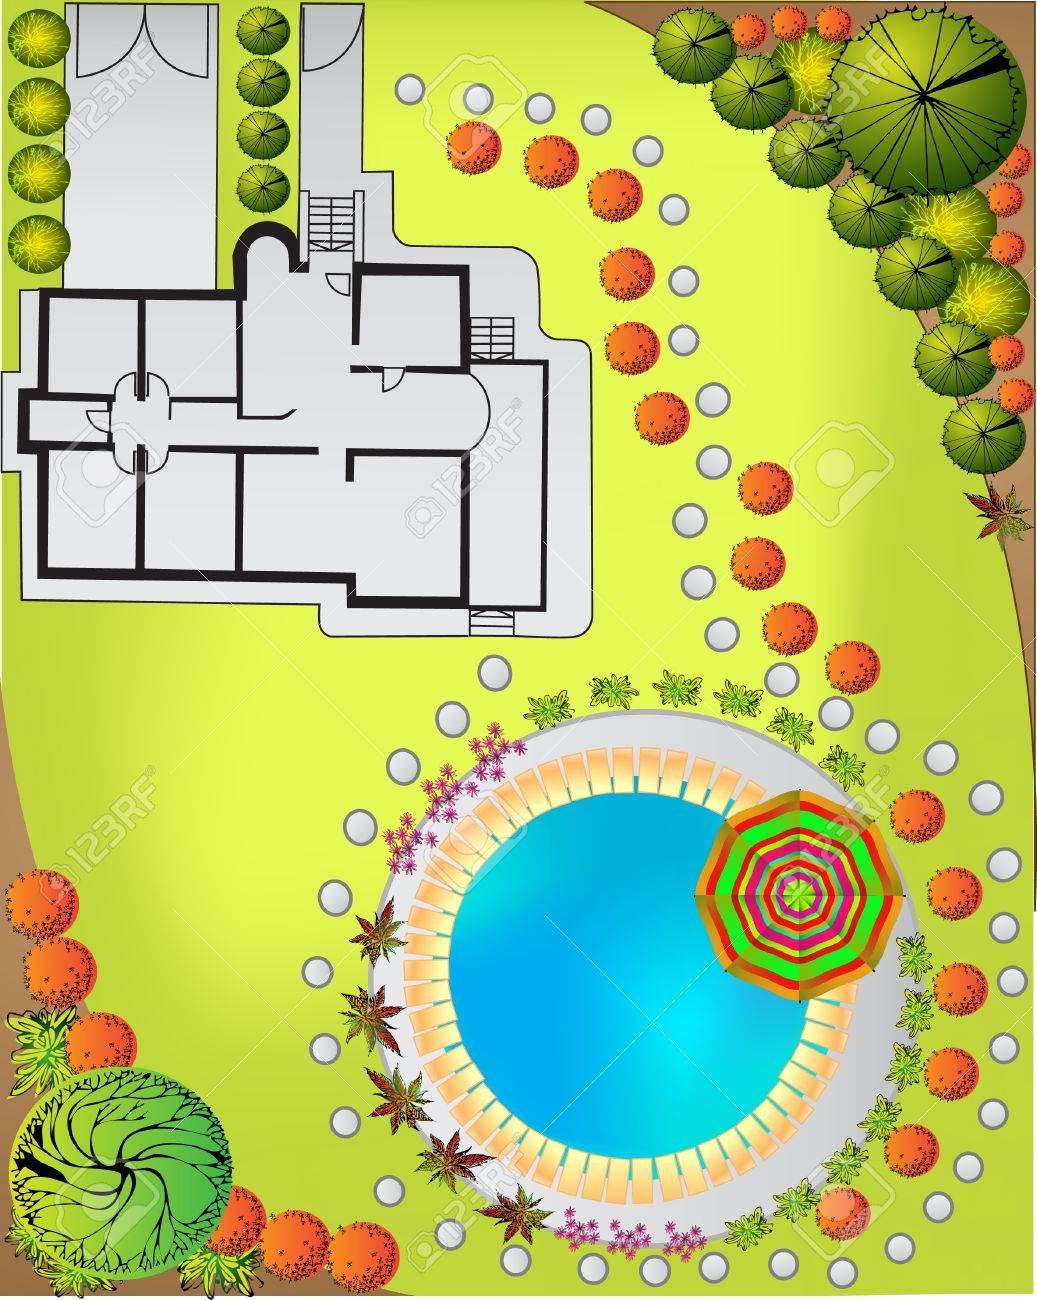 Colored Plan of garden decorative plants Stock Vector - 10068670